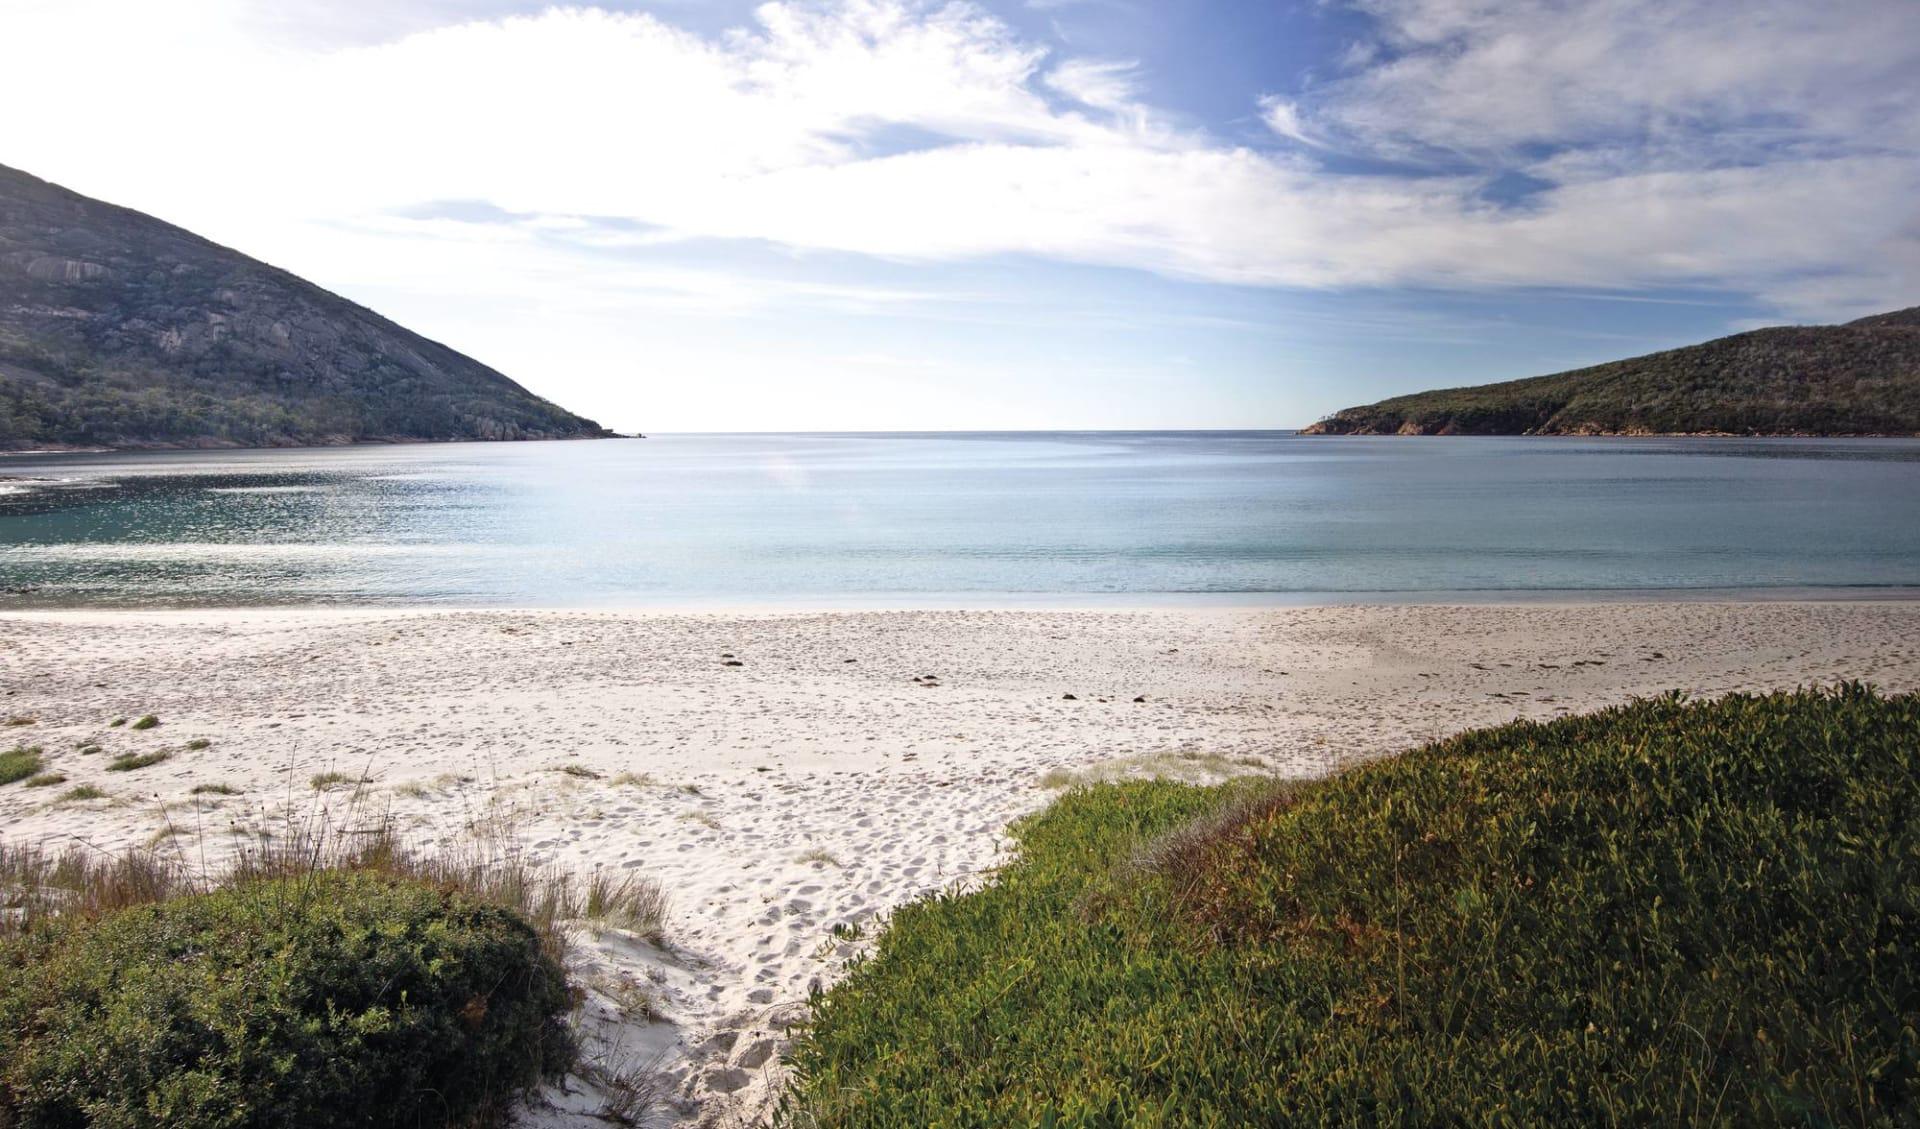 Tasmanien für Geniesser 5 Tage ab Launceston: Australia - Tasmania - Freycinet NP - Sandstrand